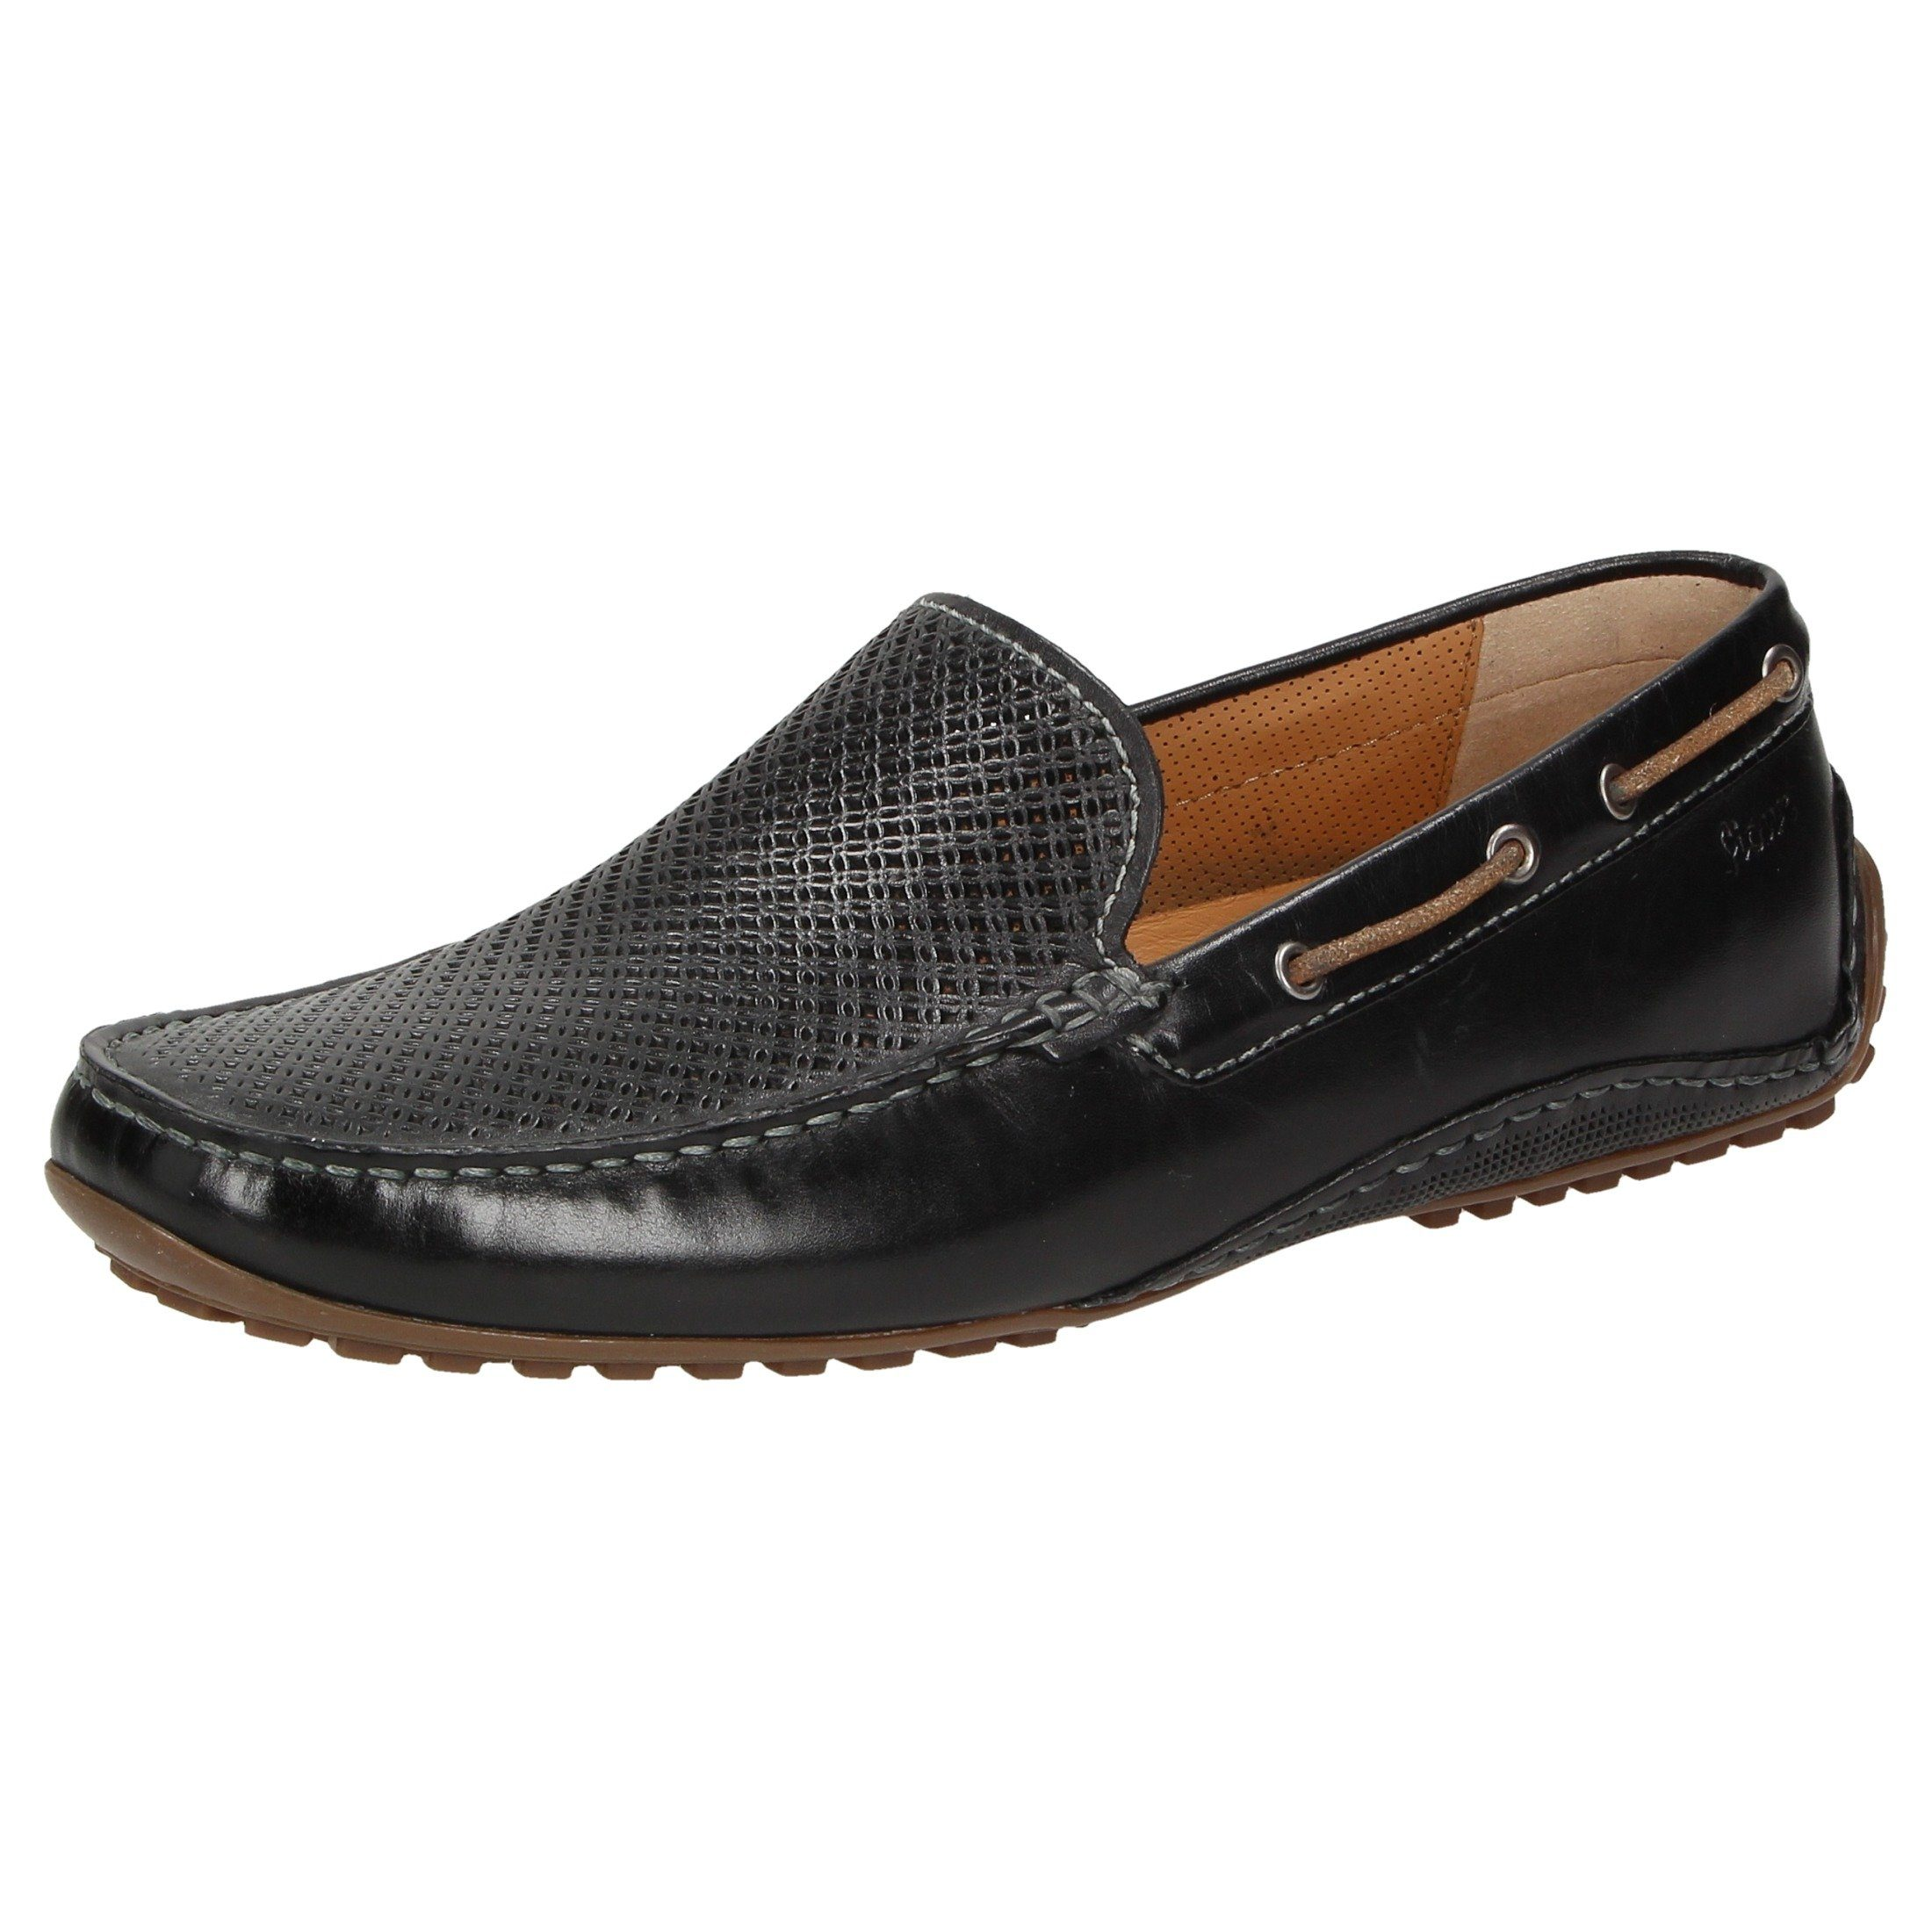 SIOUX Slipper Carulio-700 | Schuhe > Slipper | Sioux